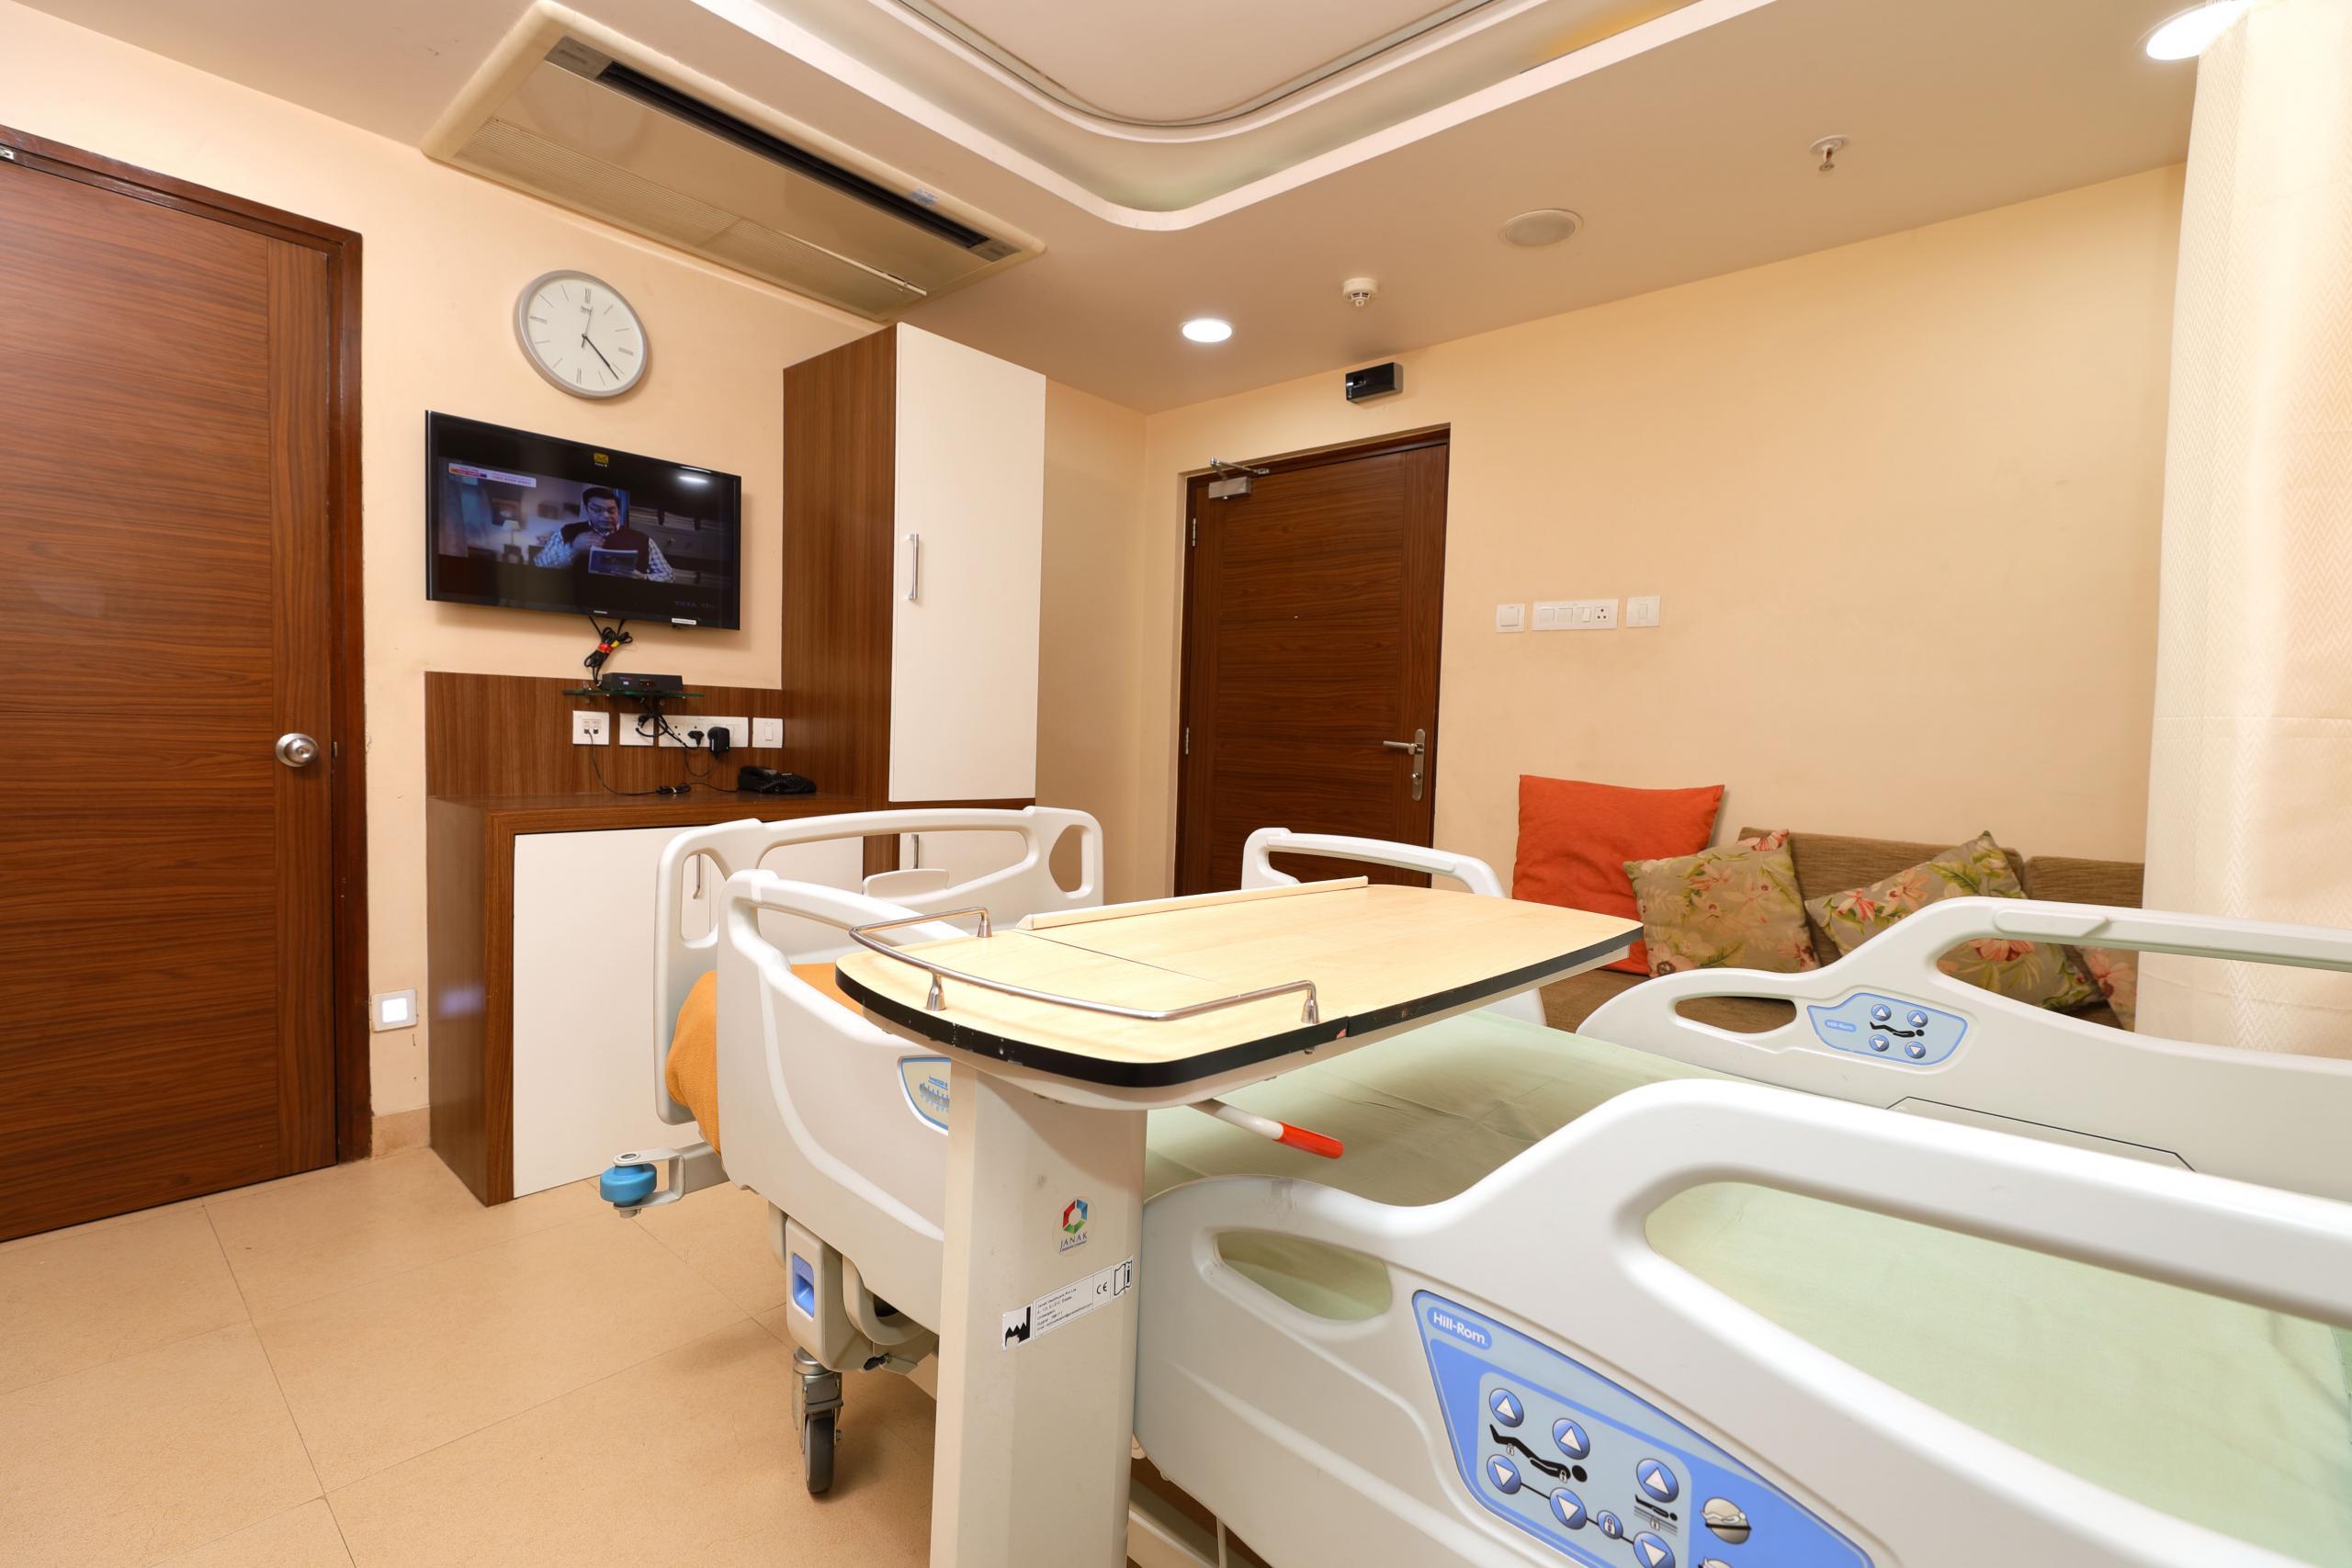 Best Maternity Hospital in Kondapur, Hyderabad | Best ...